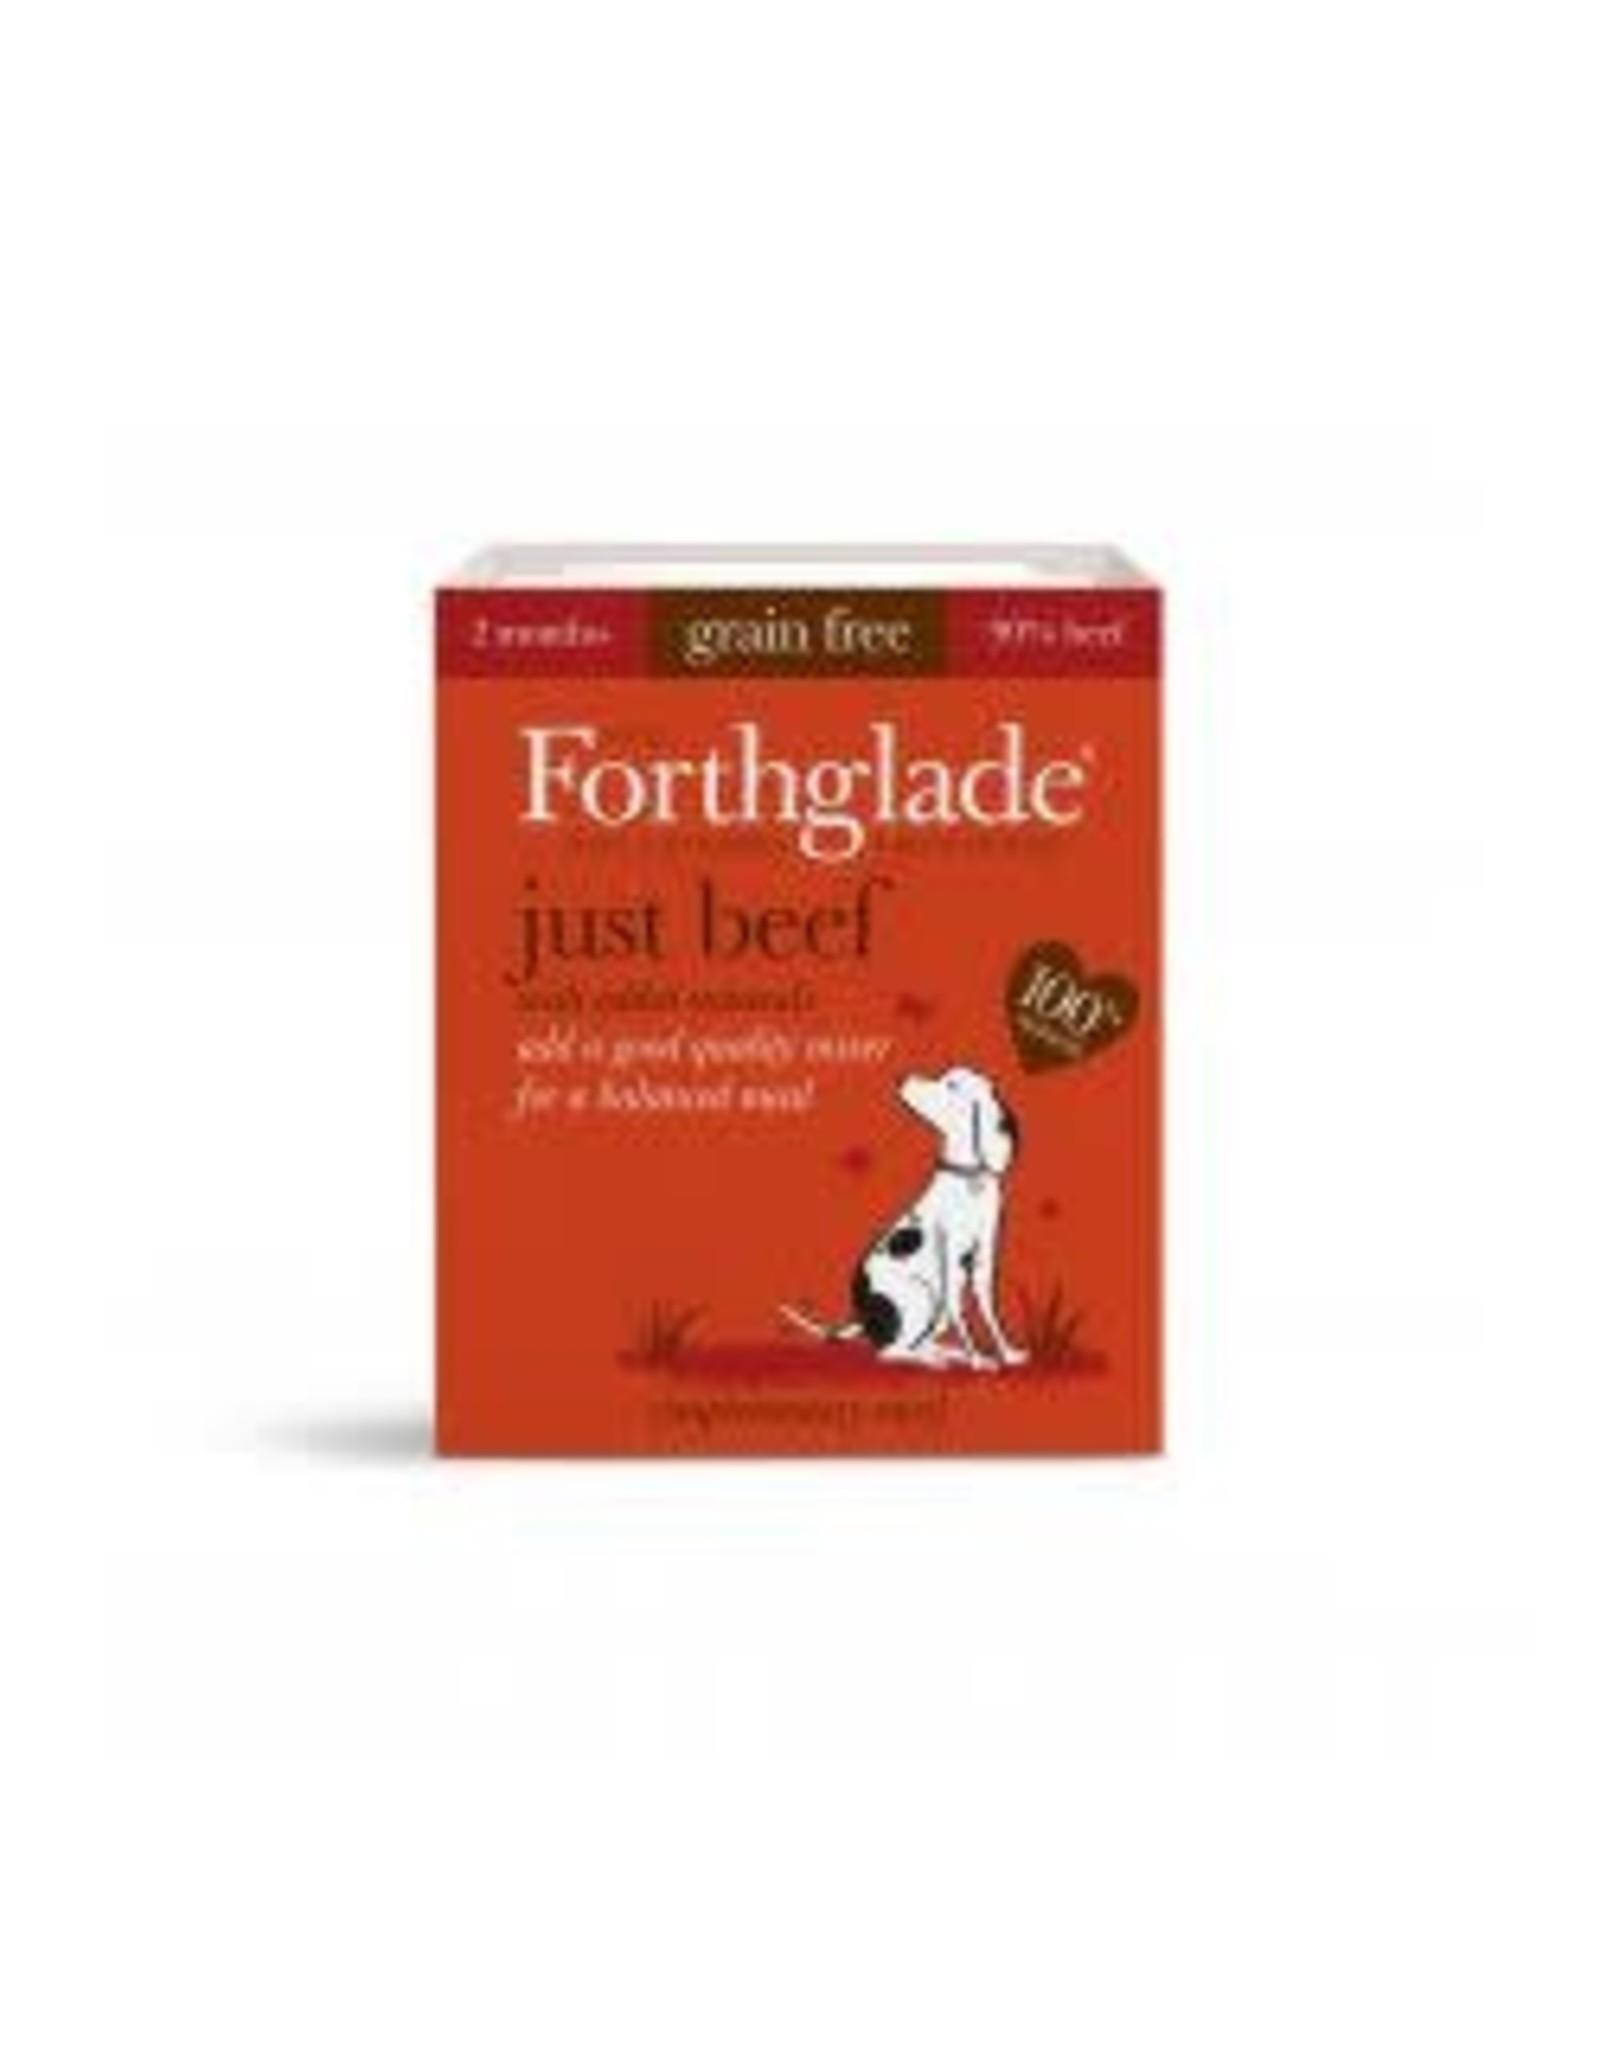 Forthglade Forthglade Just Beef Grain Free Single